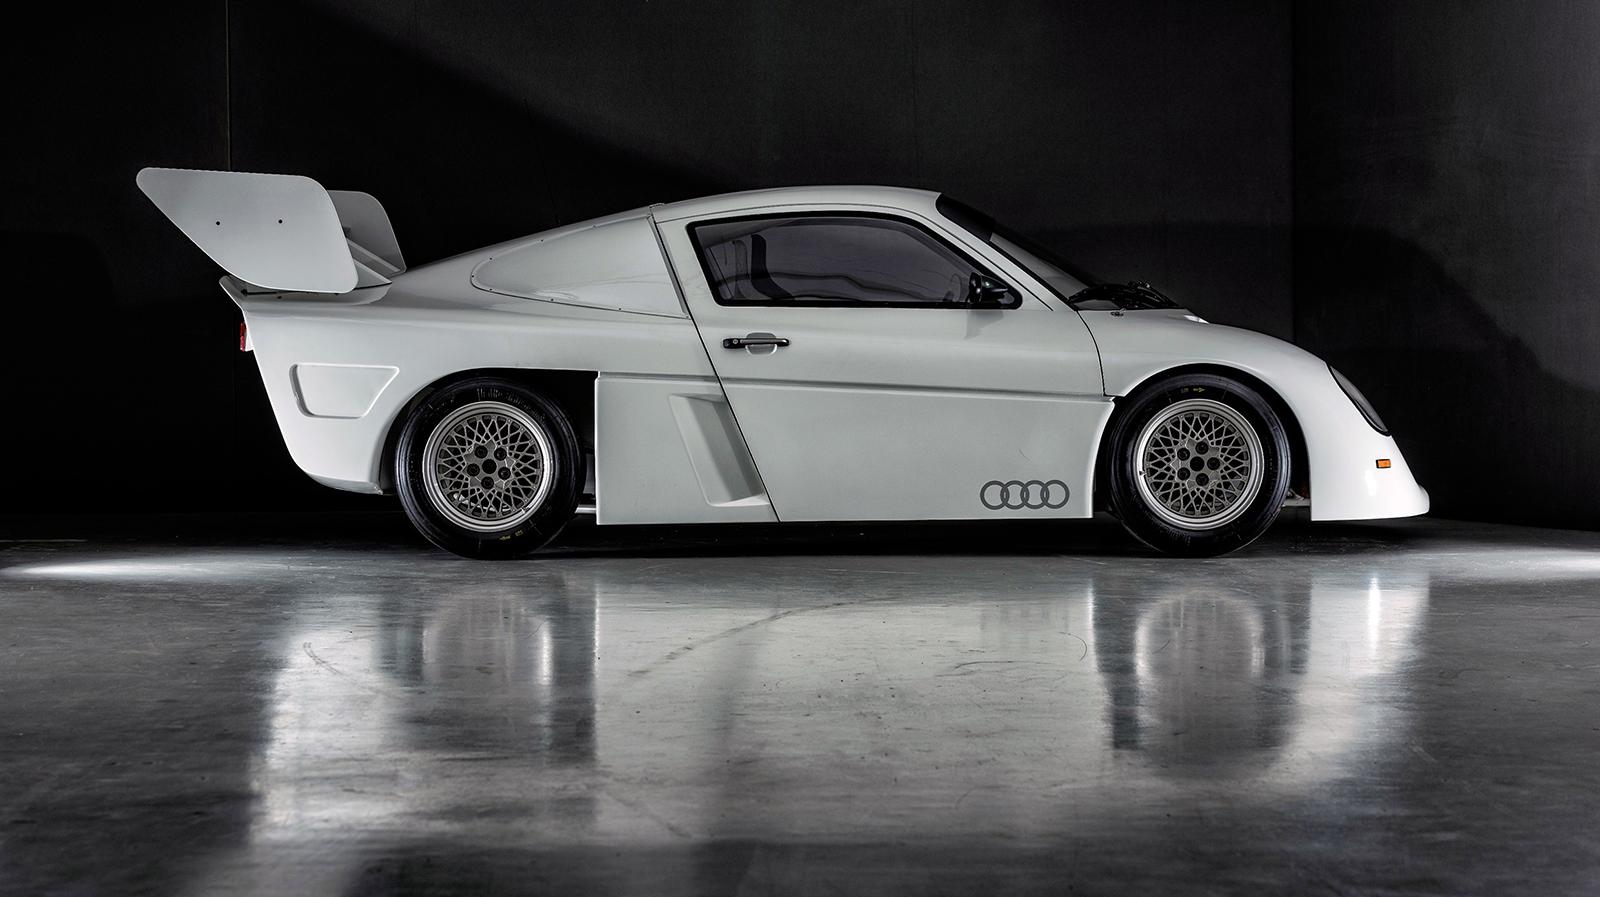 Neidfaktor-Audi-RS6-Avant-Dark-Ride-Project-342